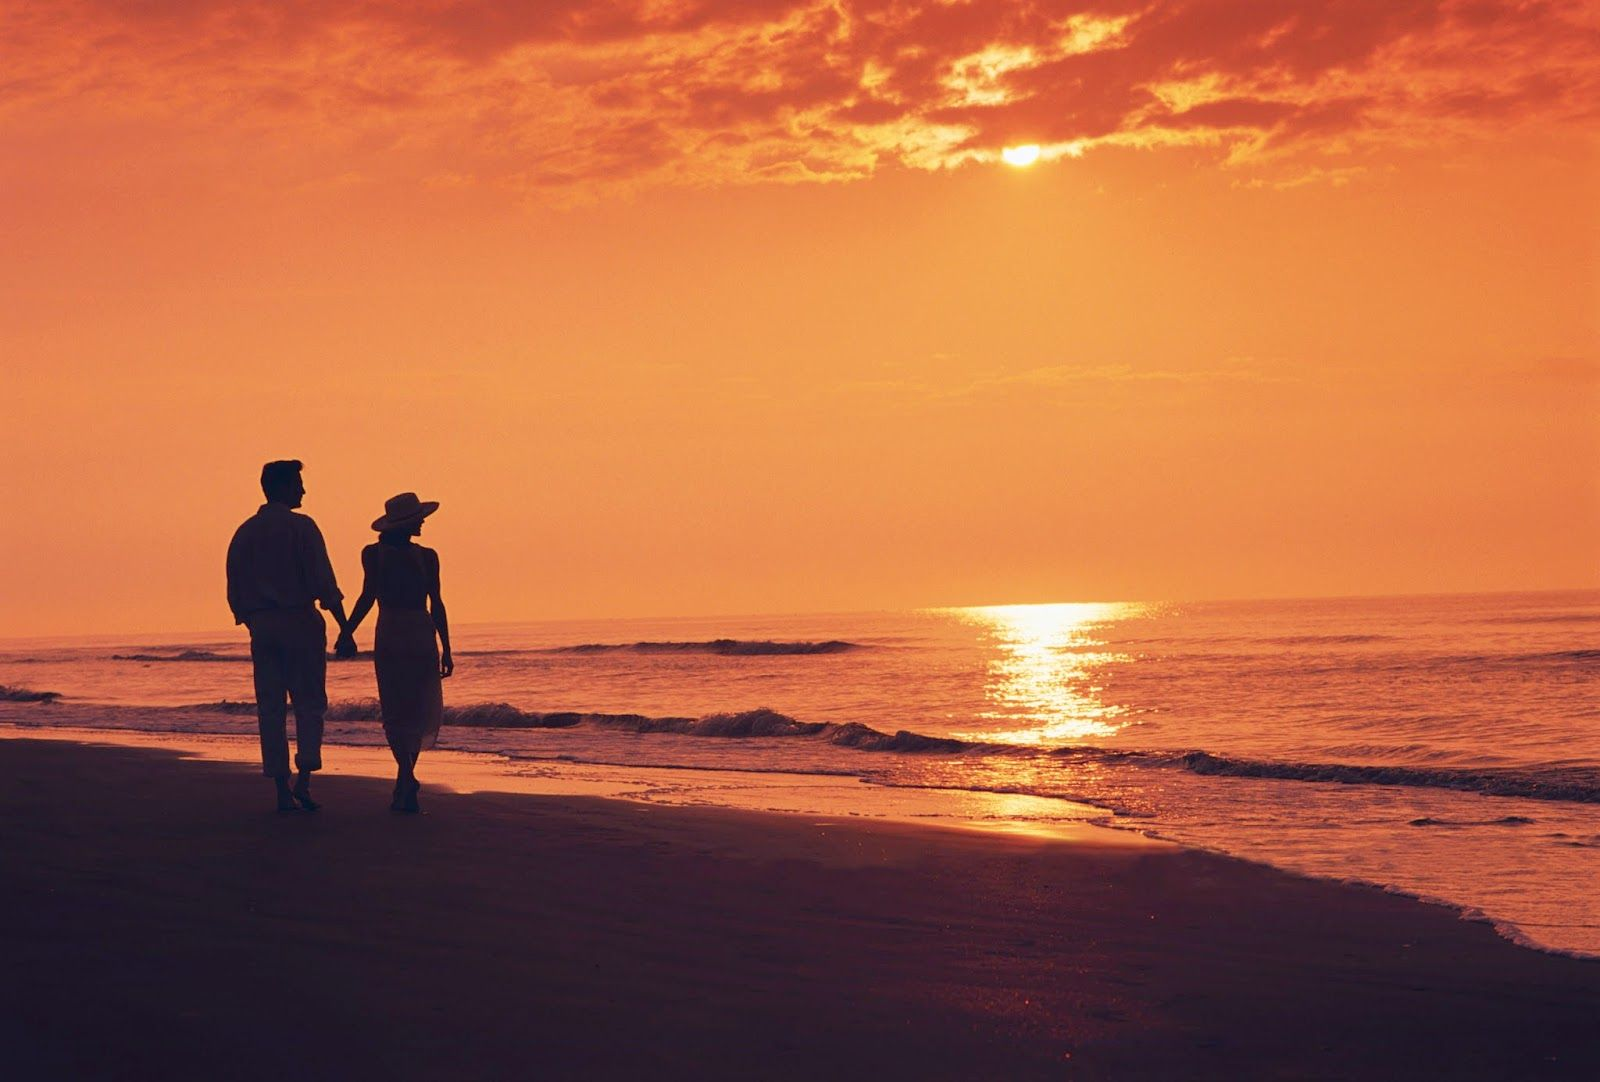 Tu Quien Eres Beach Silhouette Night Sea Sunset Silhouette Couple walk in beach love wallpapers hd